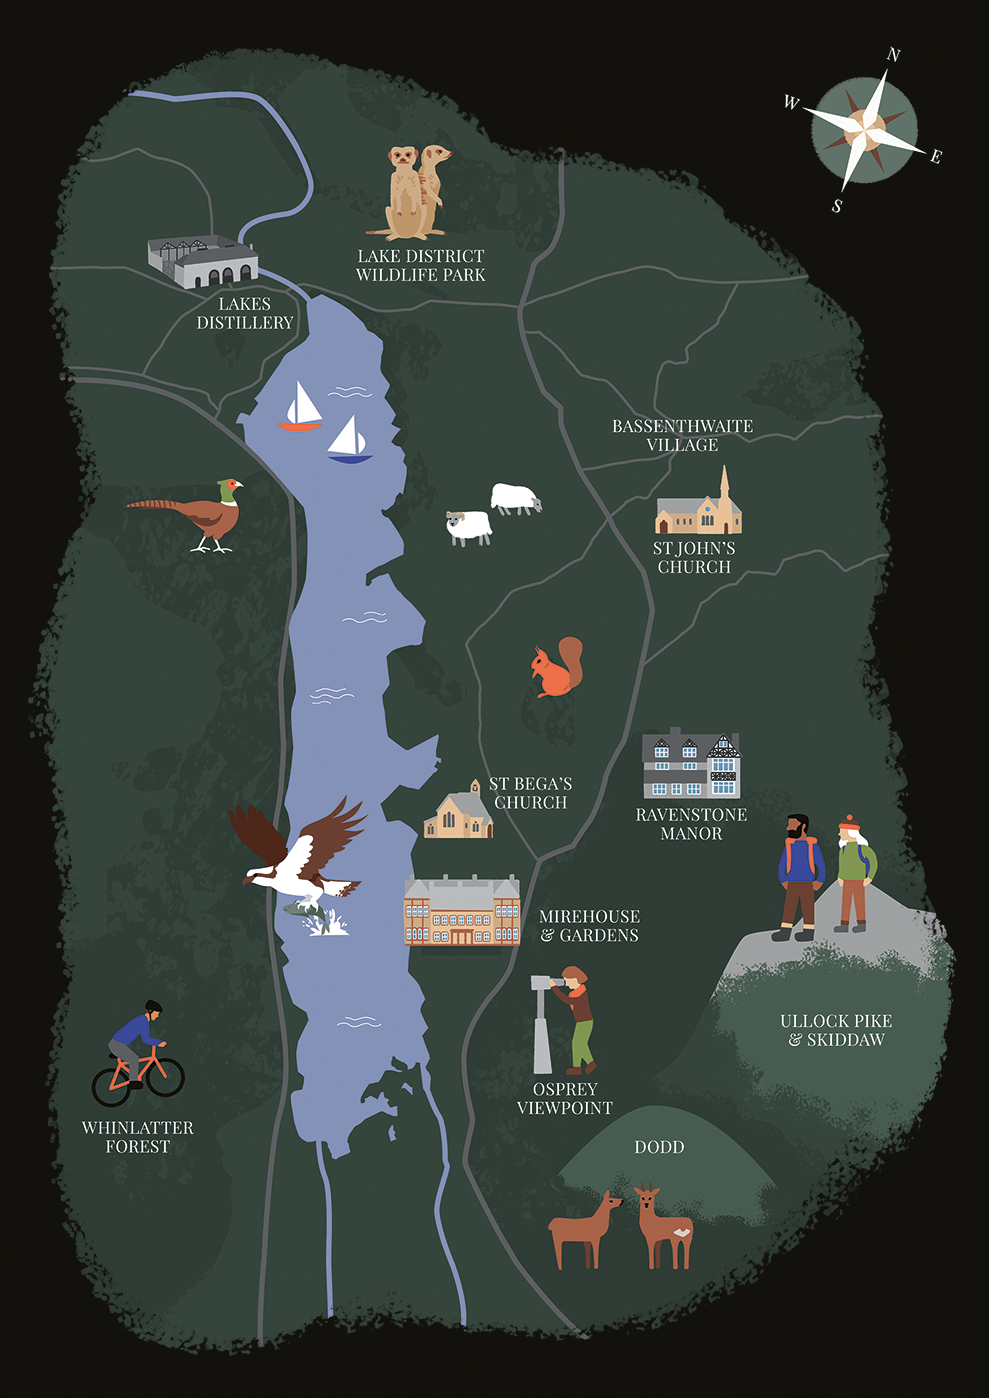 RavenstoneManor_Map.png